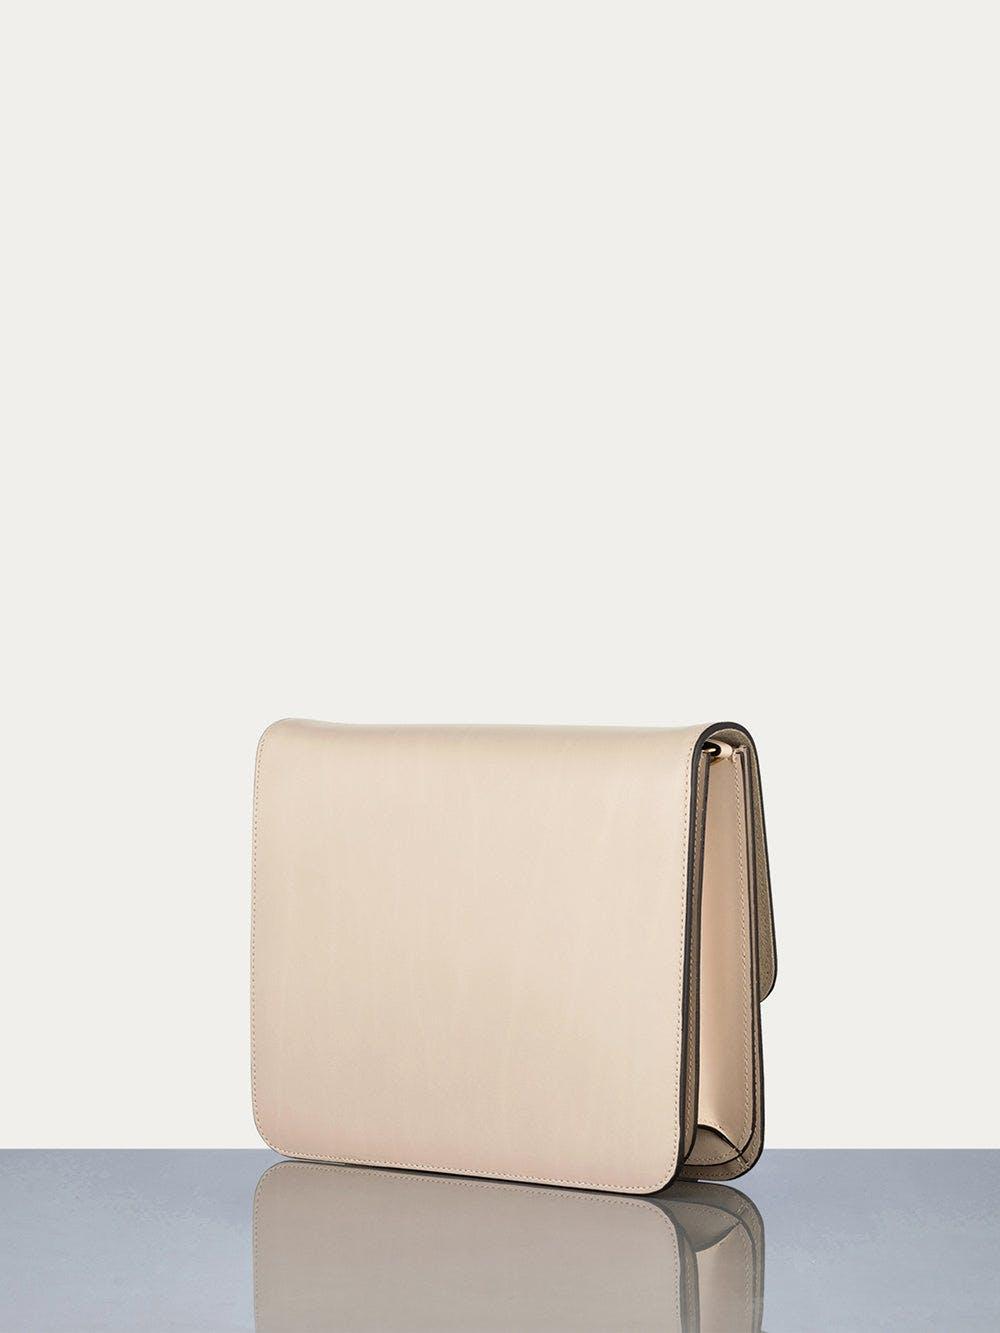 handbag back view